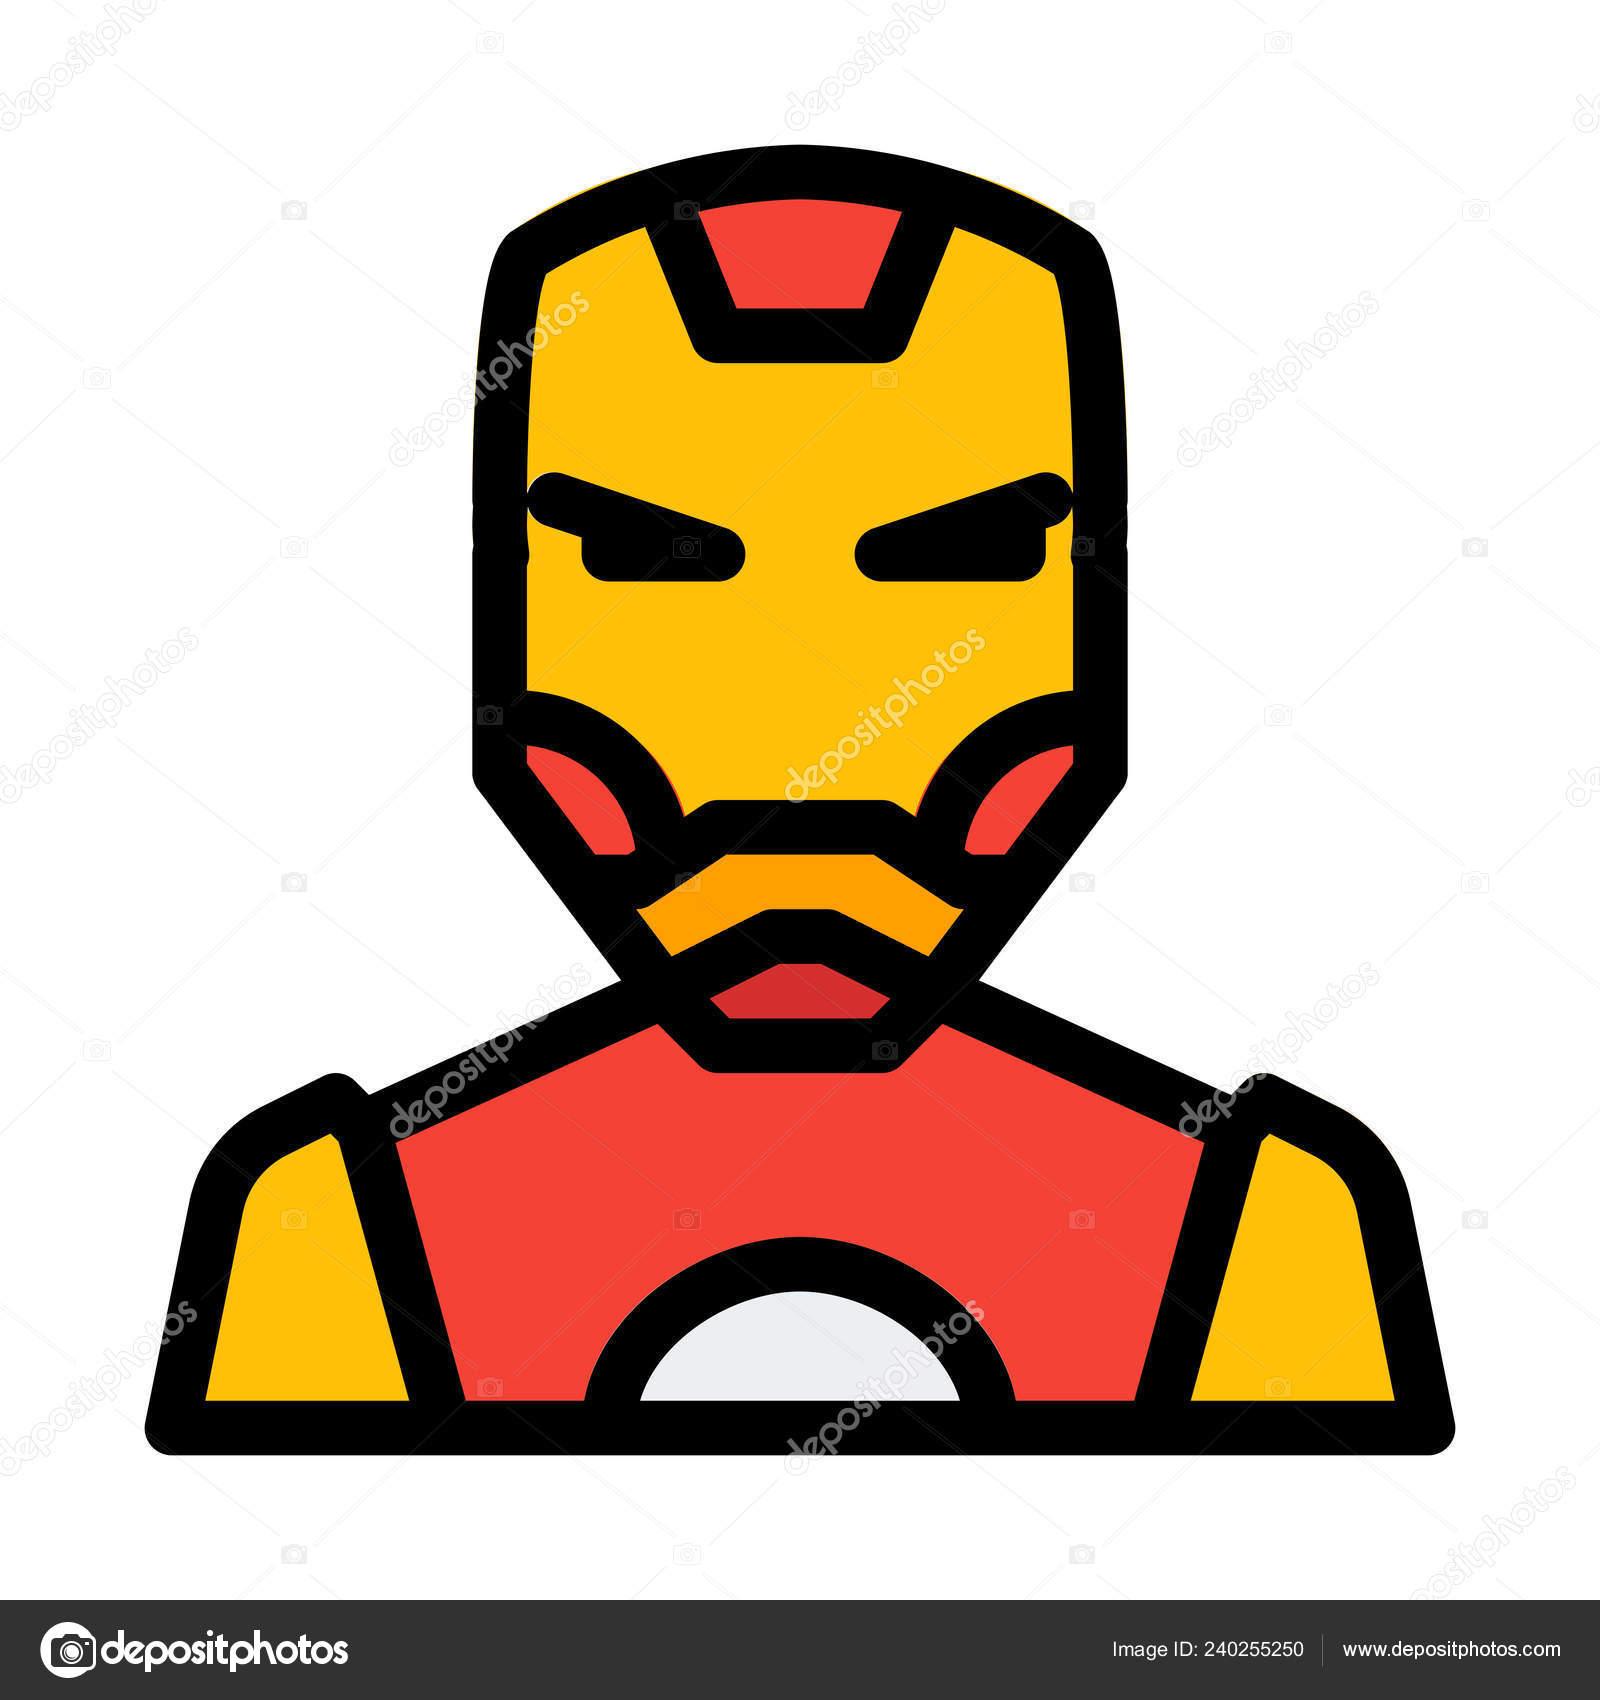 Áˆ Iron Man Cartoon Drawing Stock Illustrations Royalty Free Iron Man Cliparts Download On Depositphotos